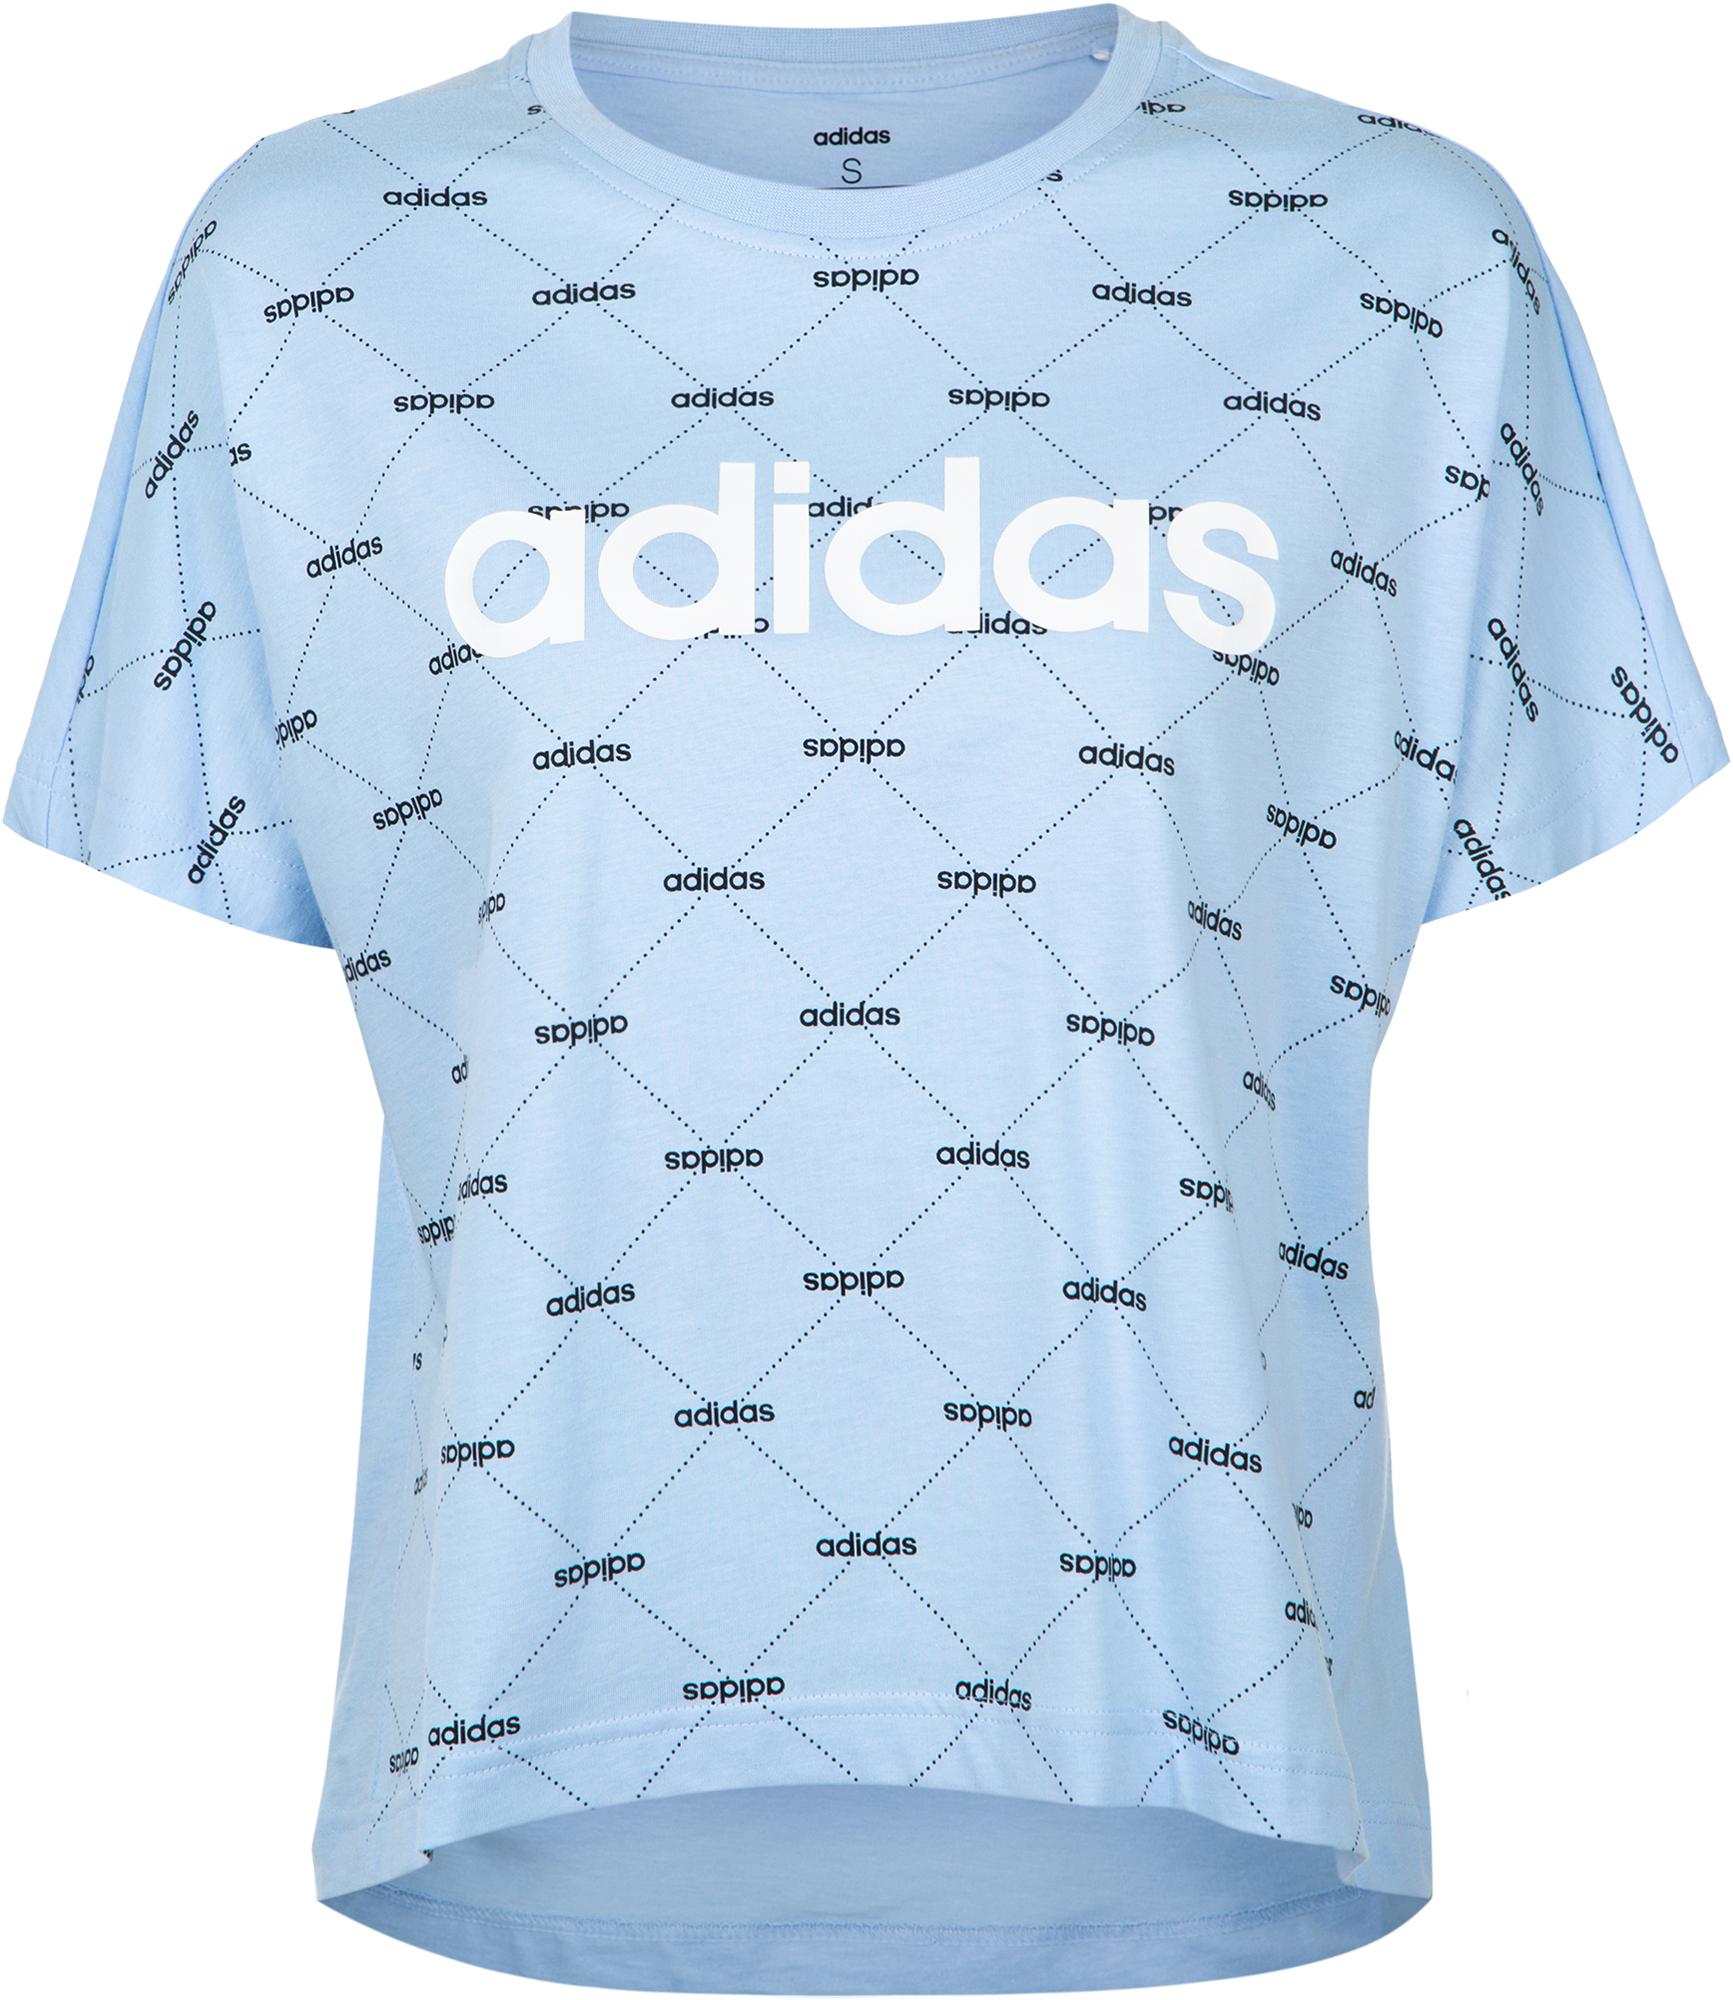 Adidas Футболка женская Adidas Linear Graphic, размер 50-52 цена